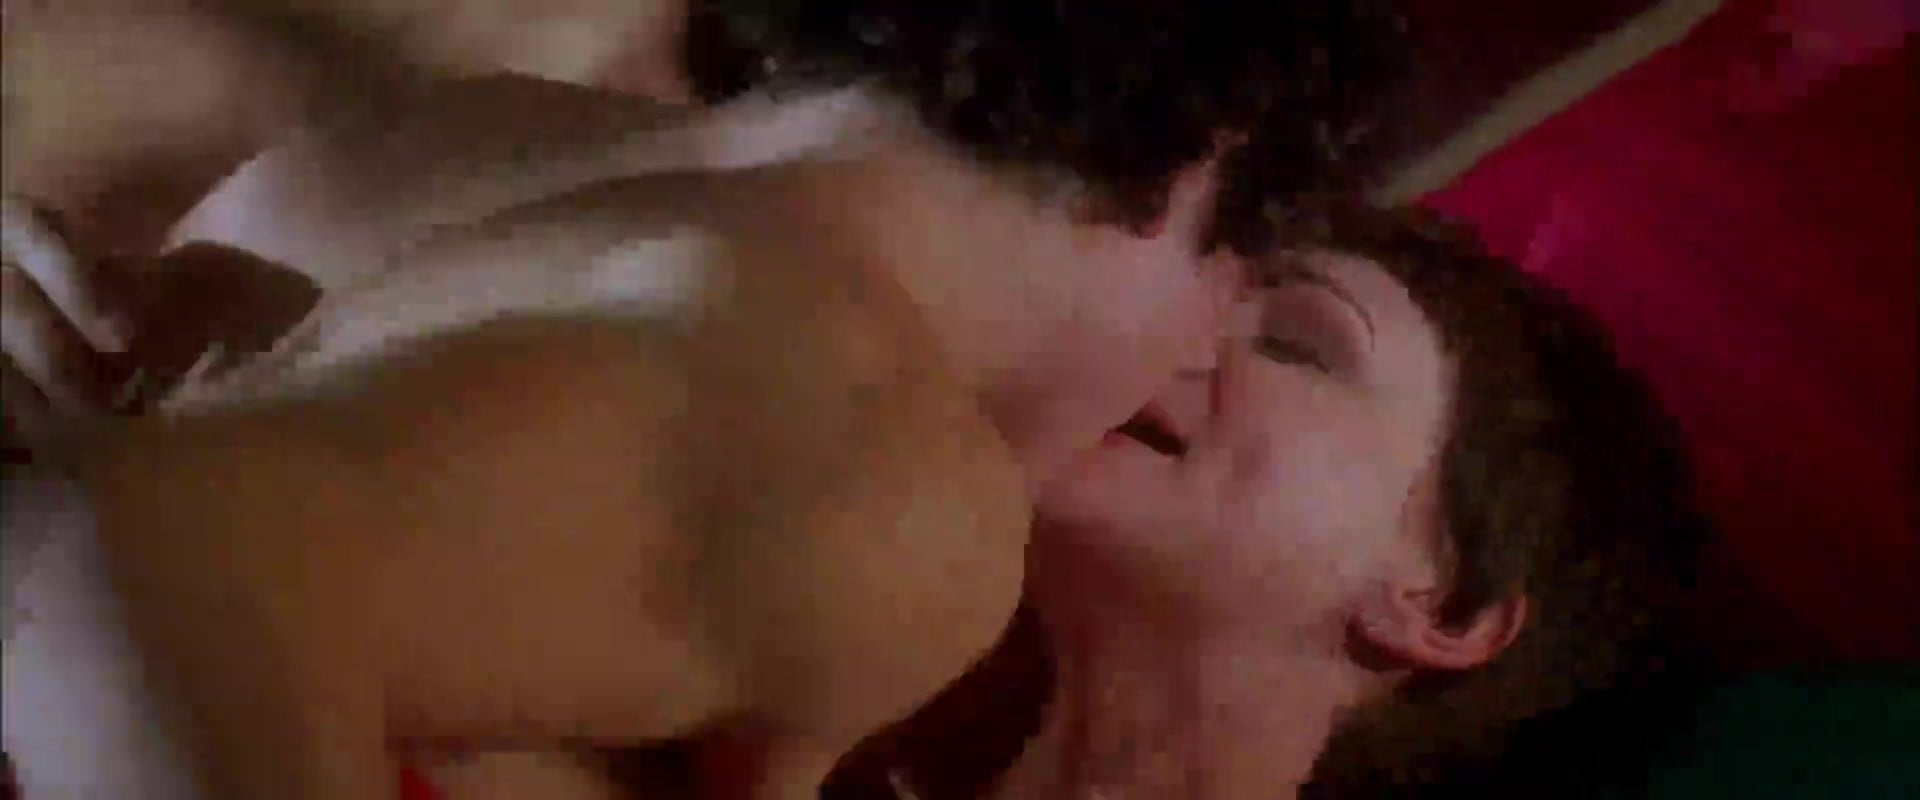 Something is. Carey mulligan tits